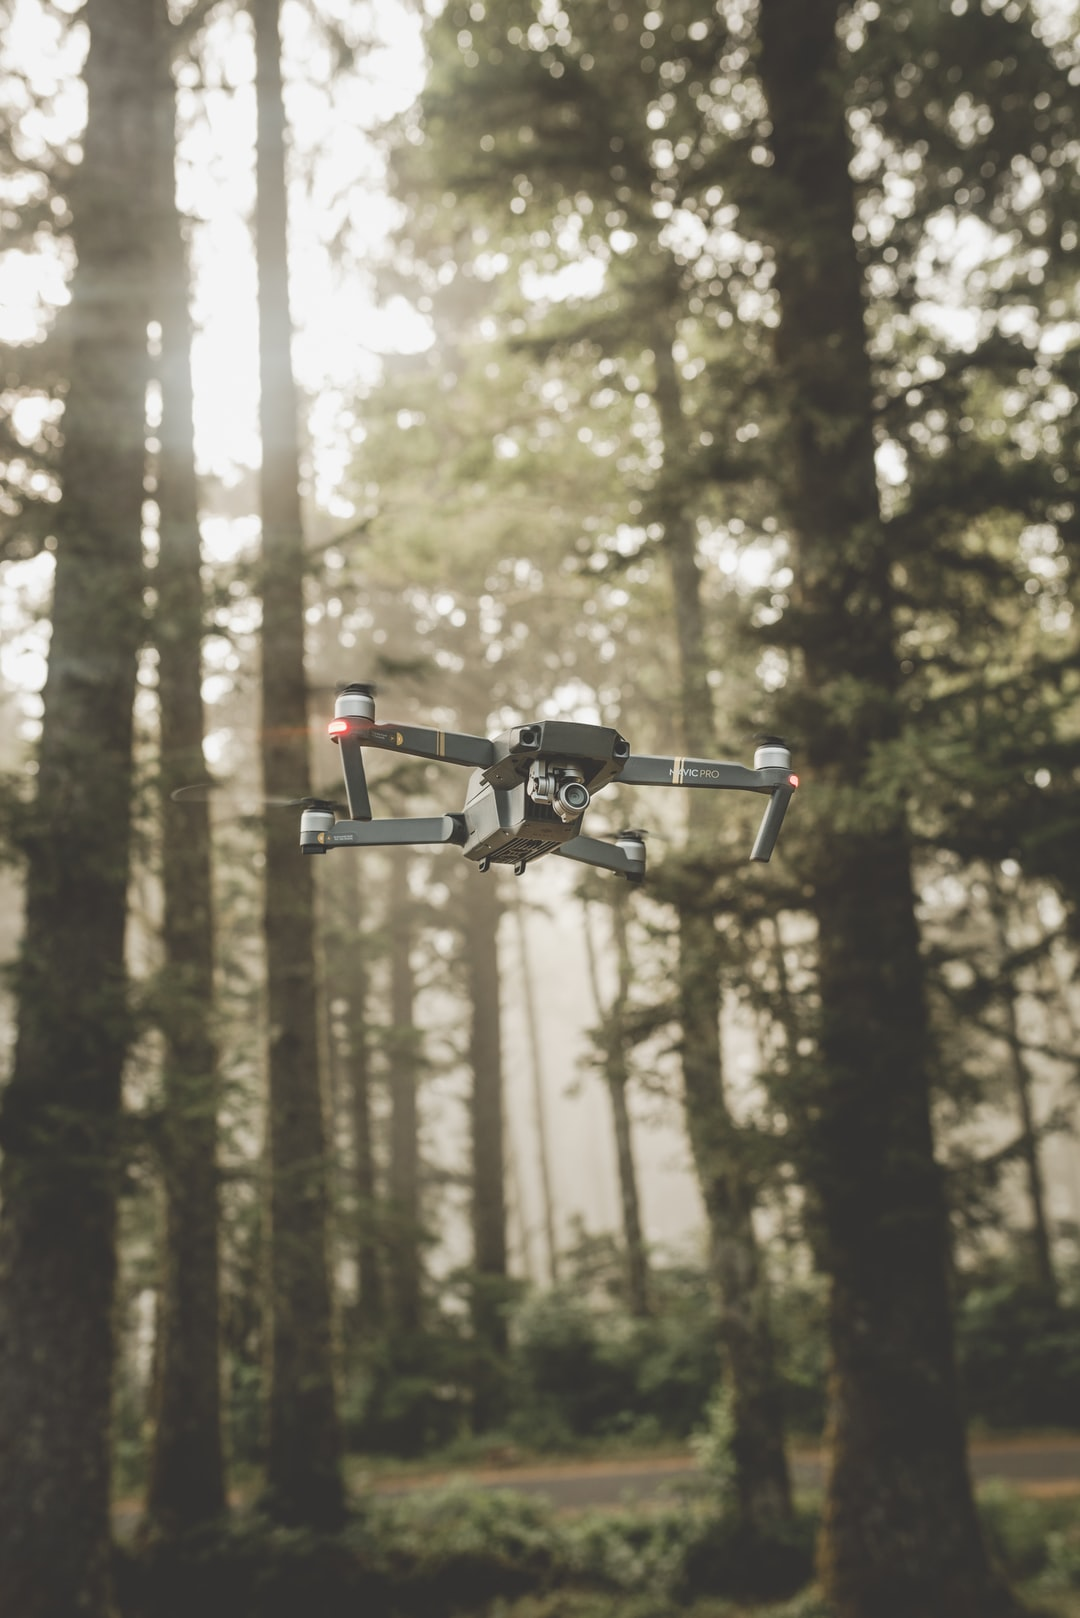 Drone Strikes in America